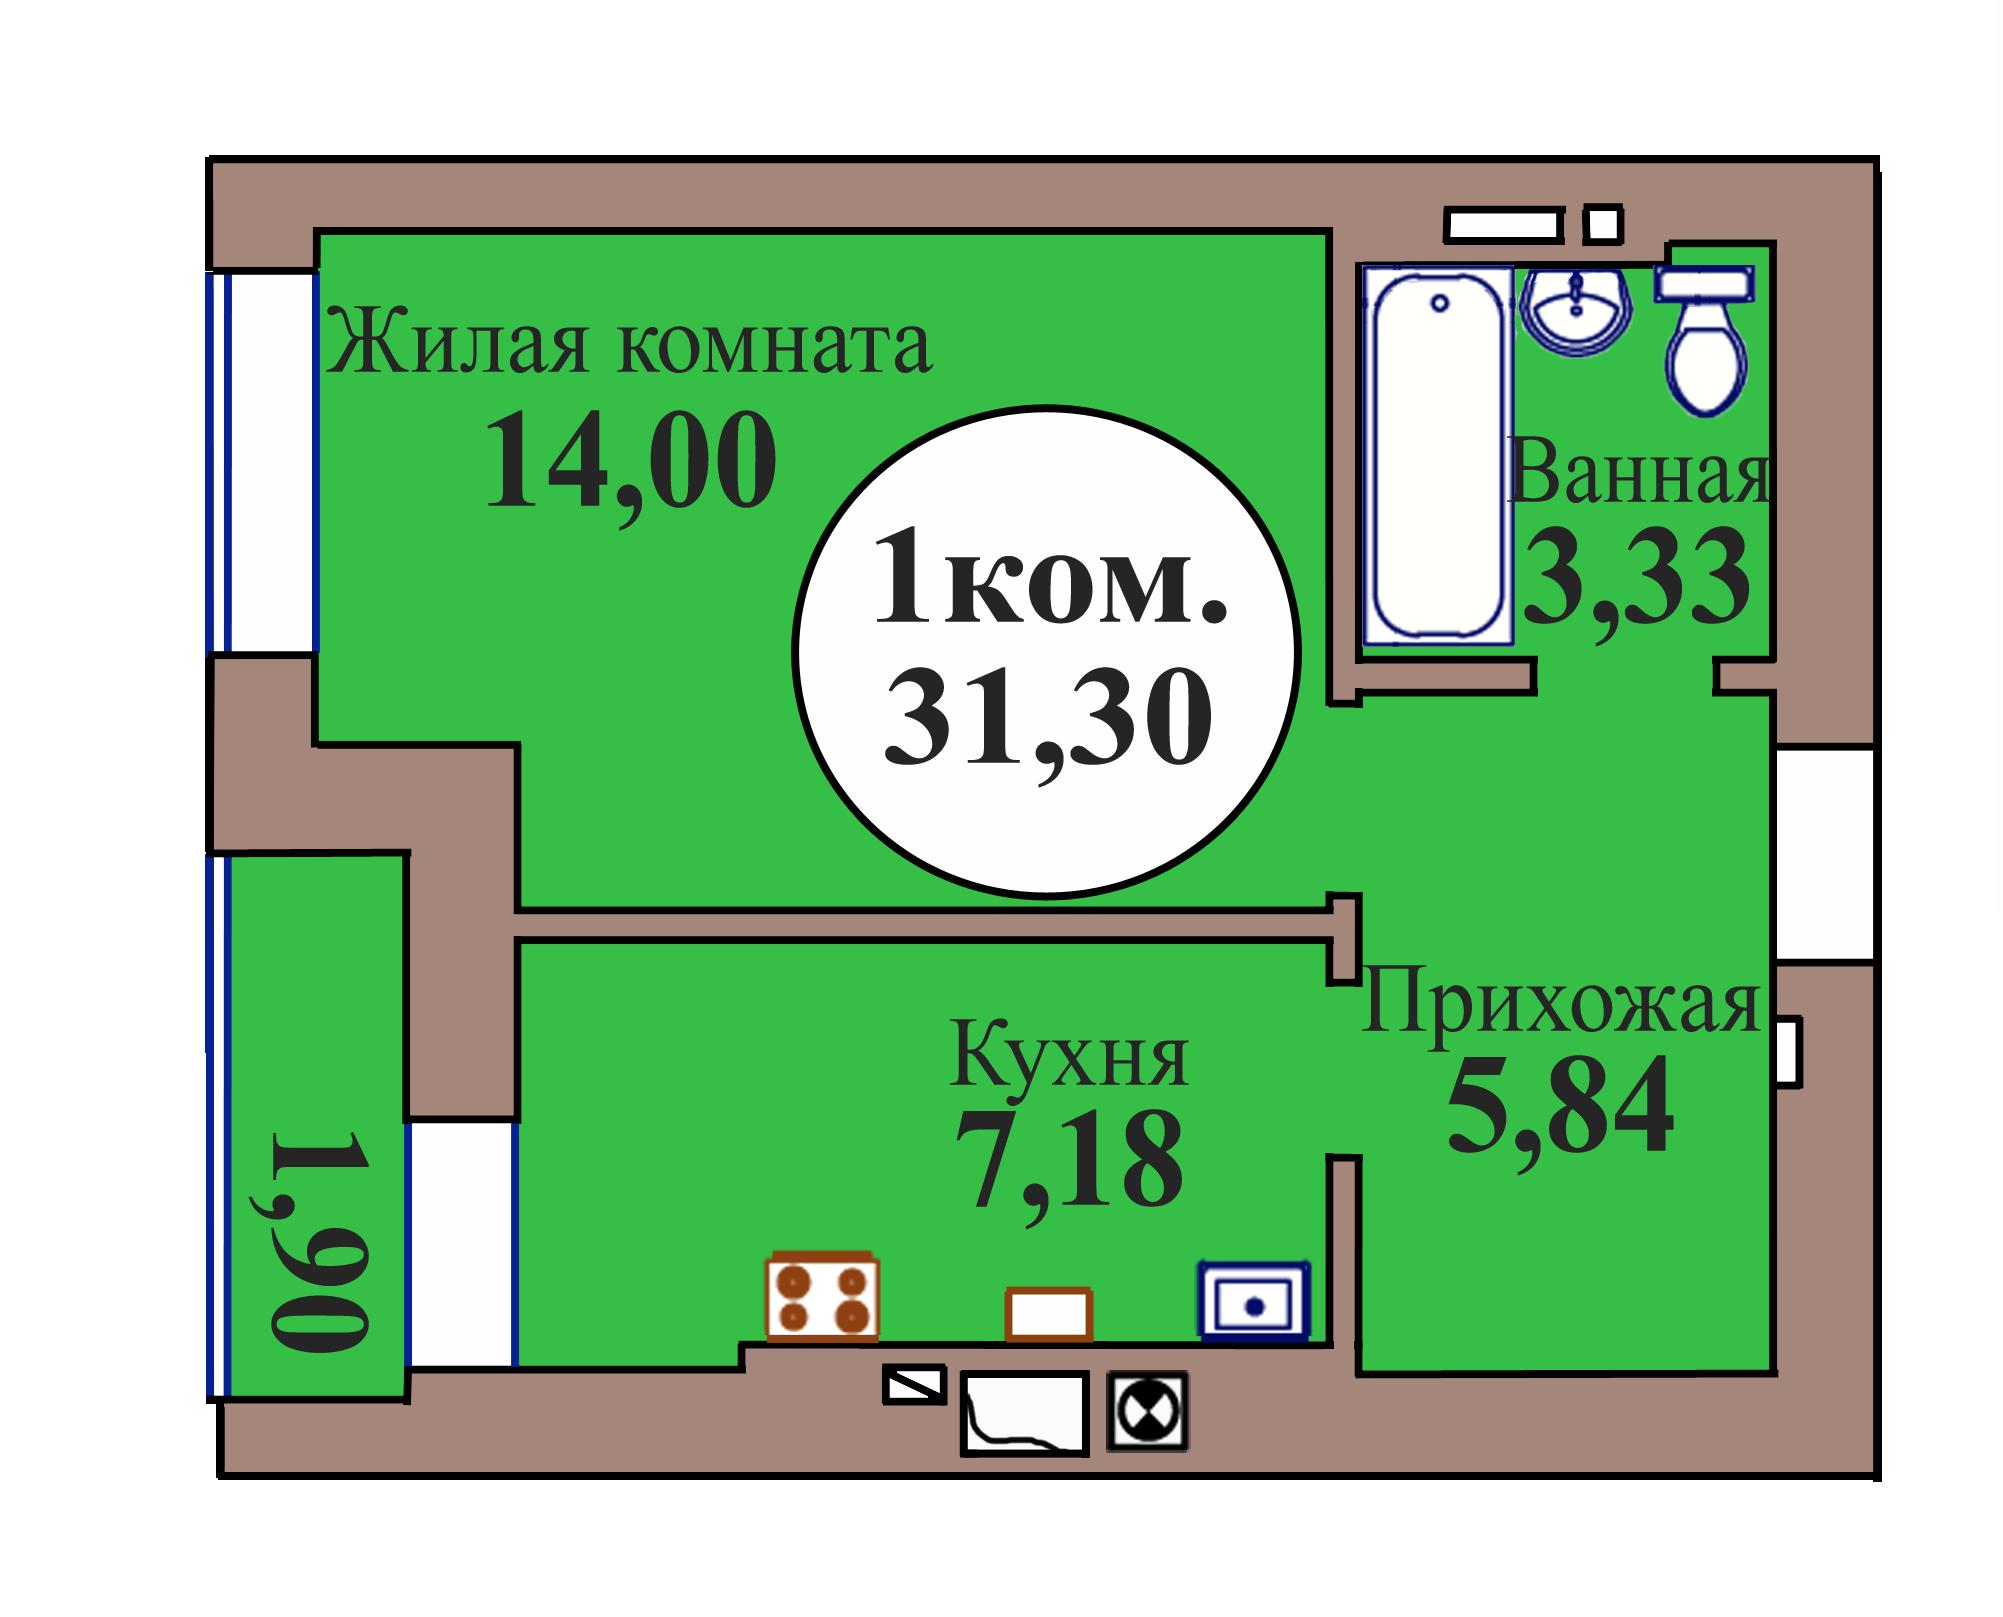 1-комн. кв. по ГП дом №3, МКР Васильково, кв. 35 в Калининграде